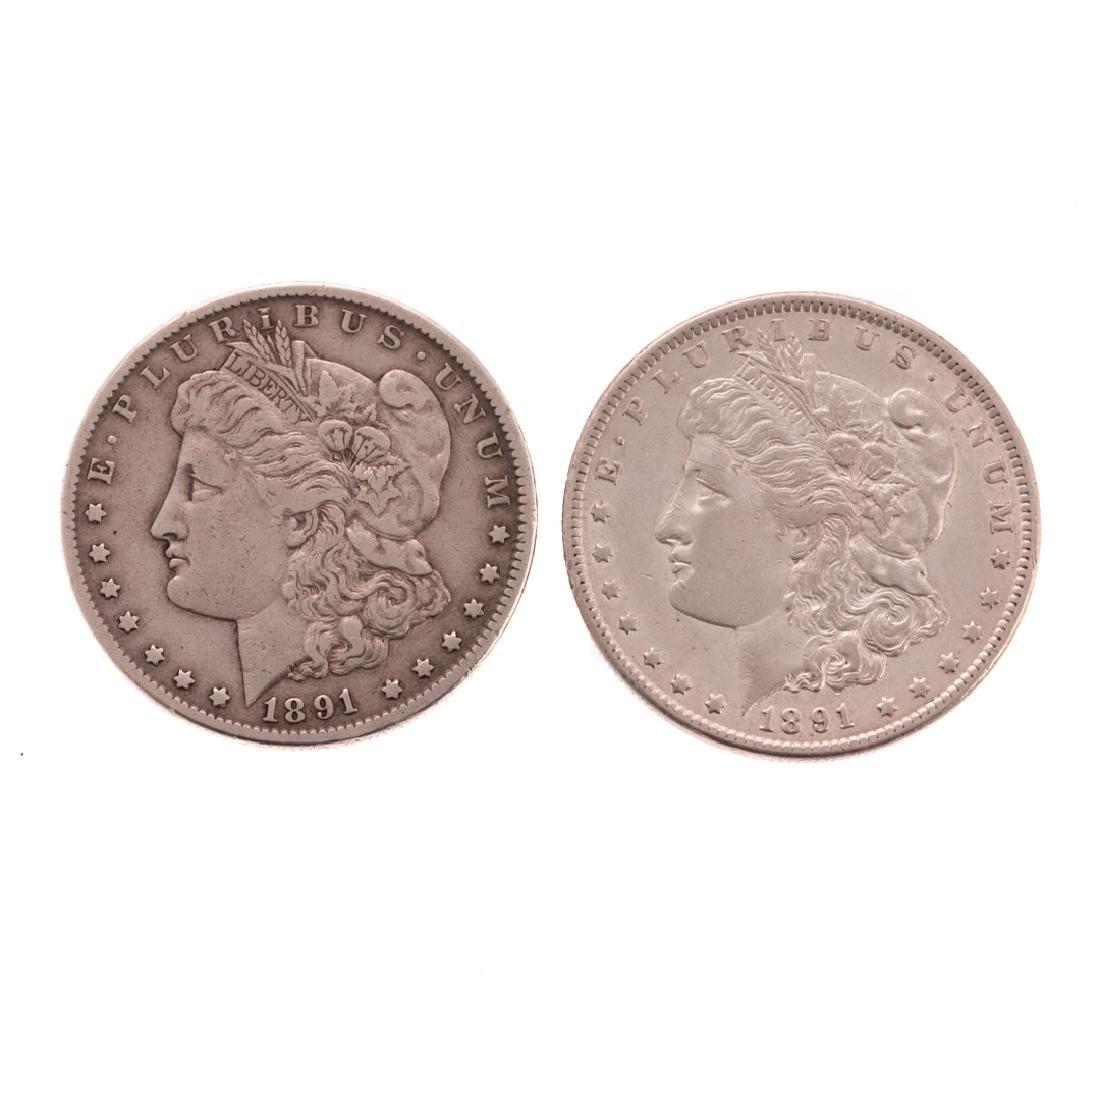 [US] 2-1891-CC Morgan Dollars, XF+ details and VF